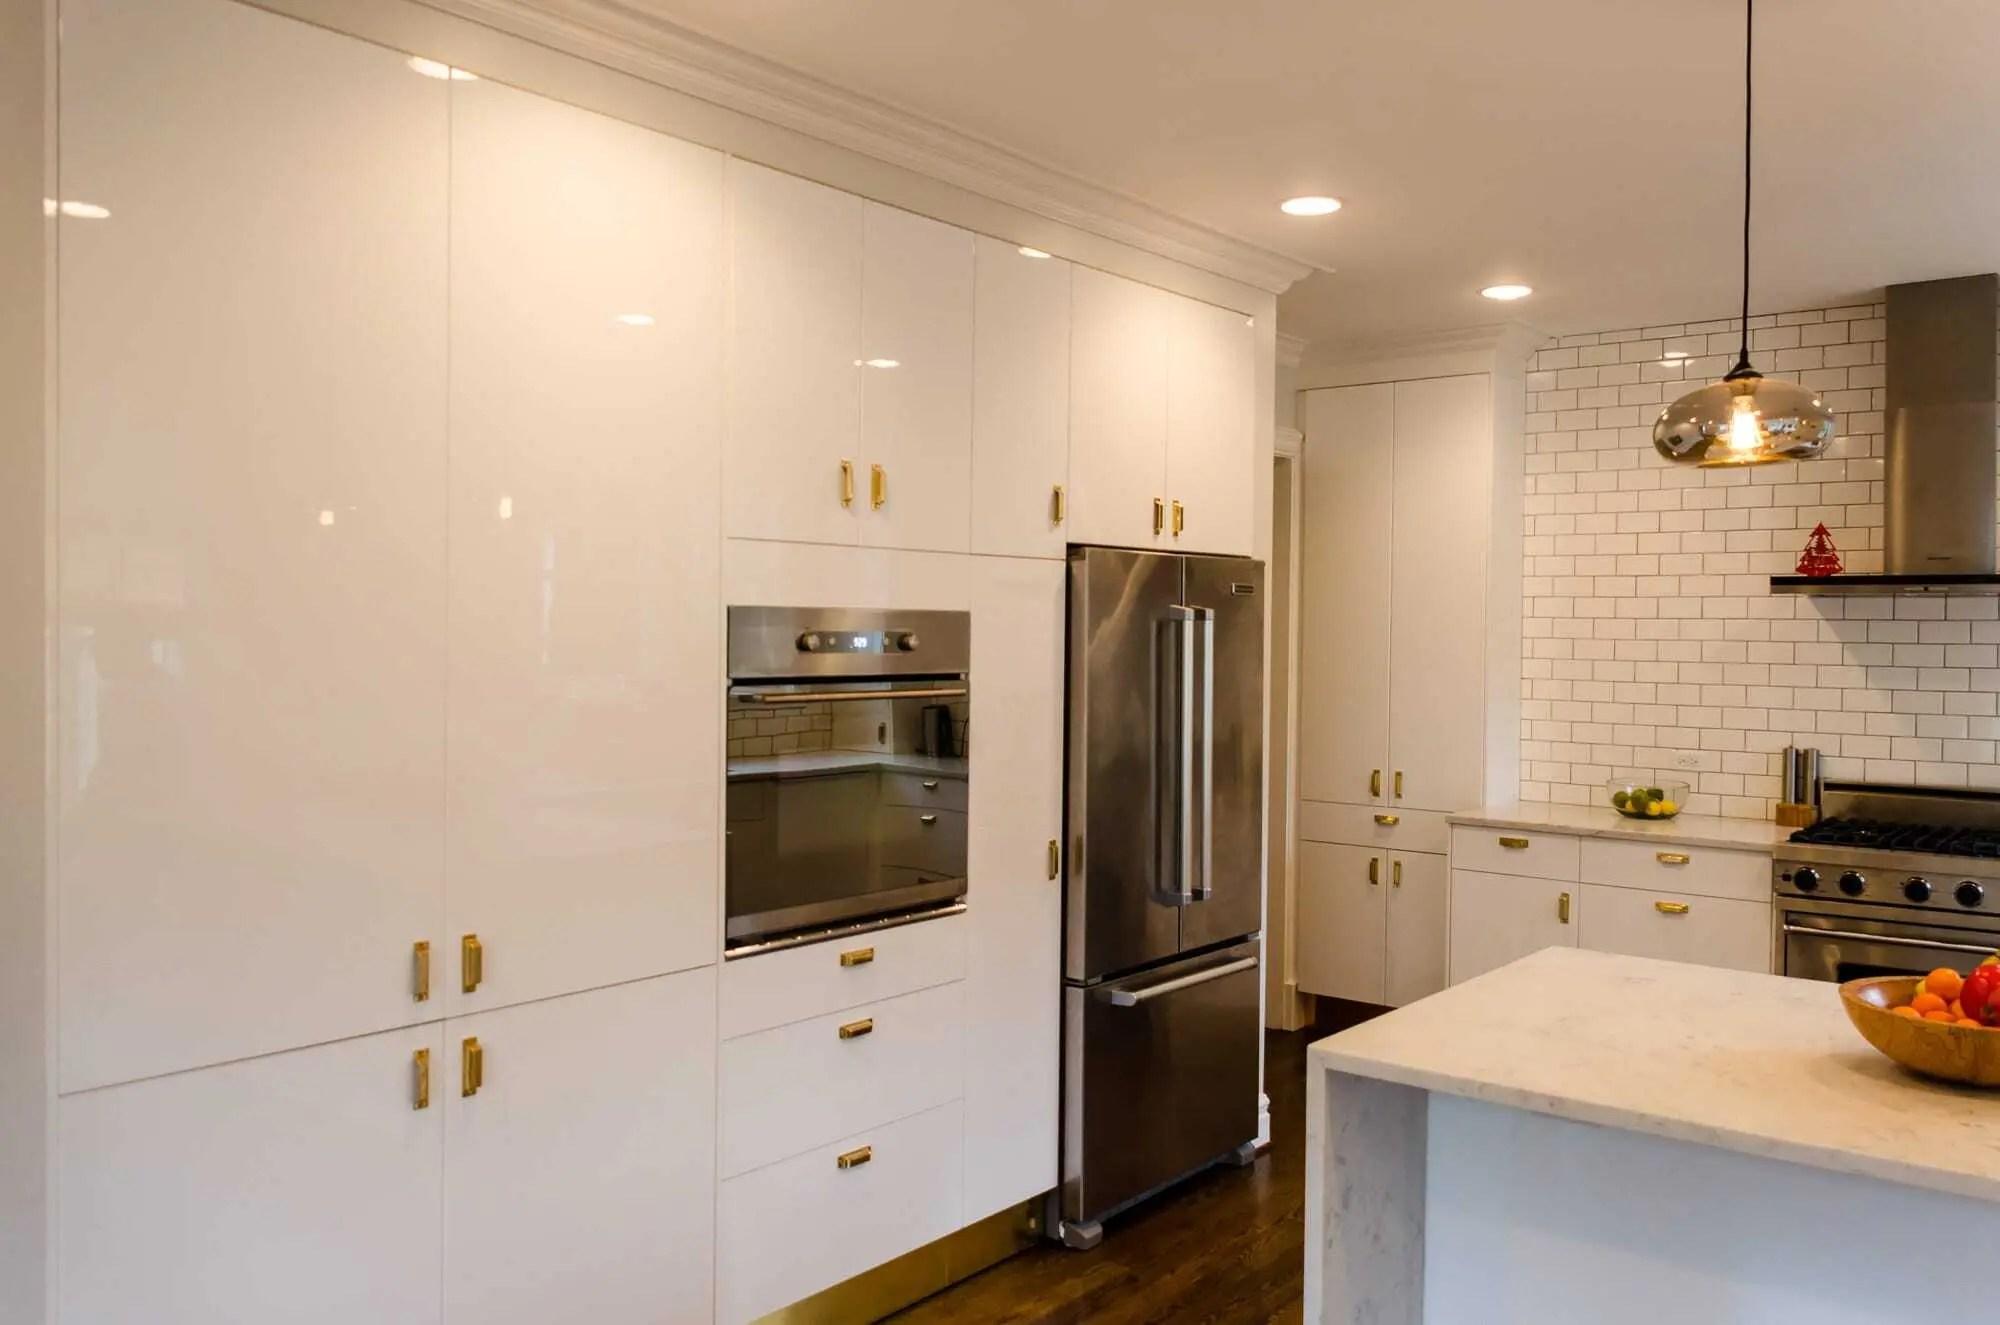 ikea hacks kitchen cabinets ikea IKEA Pantry Cabinets